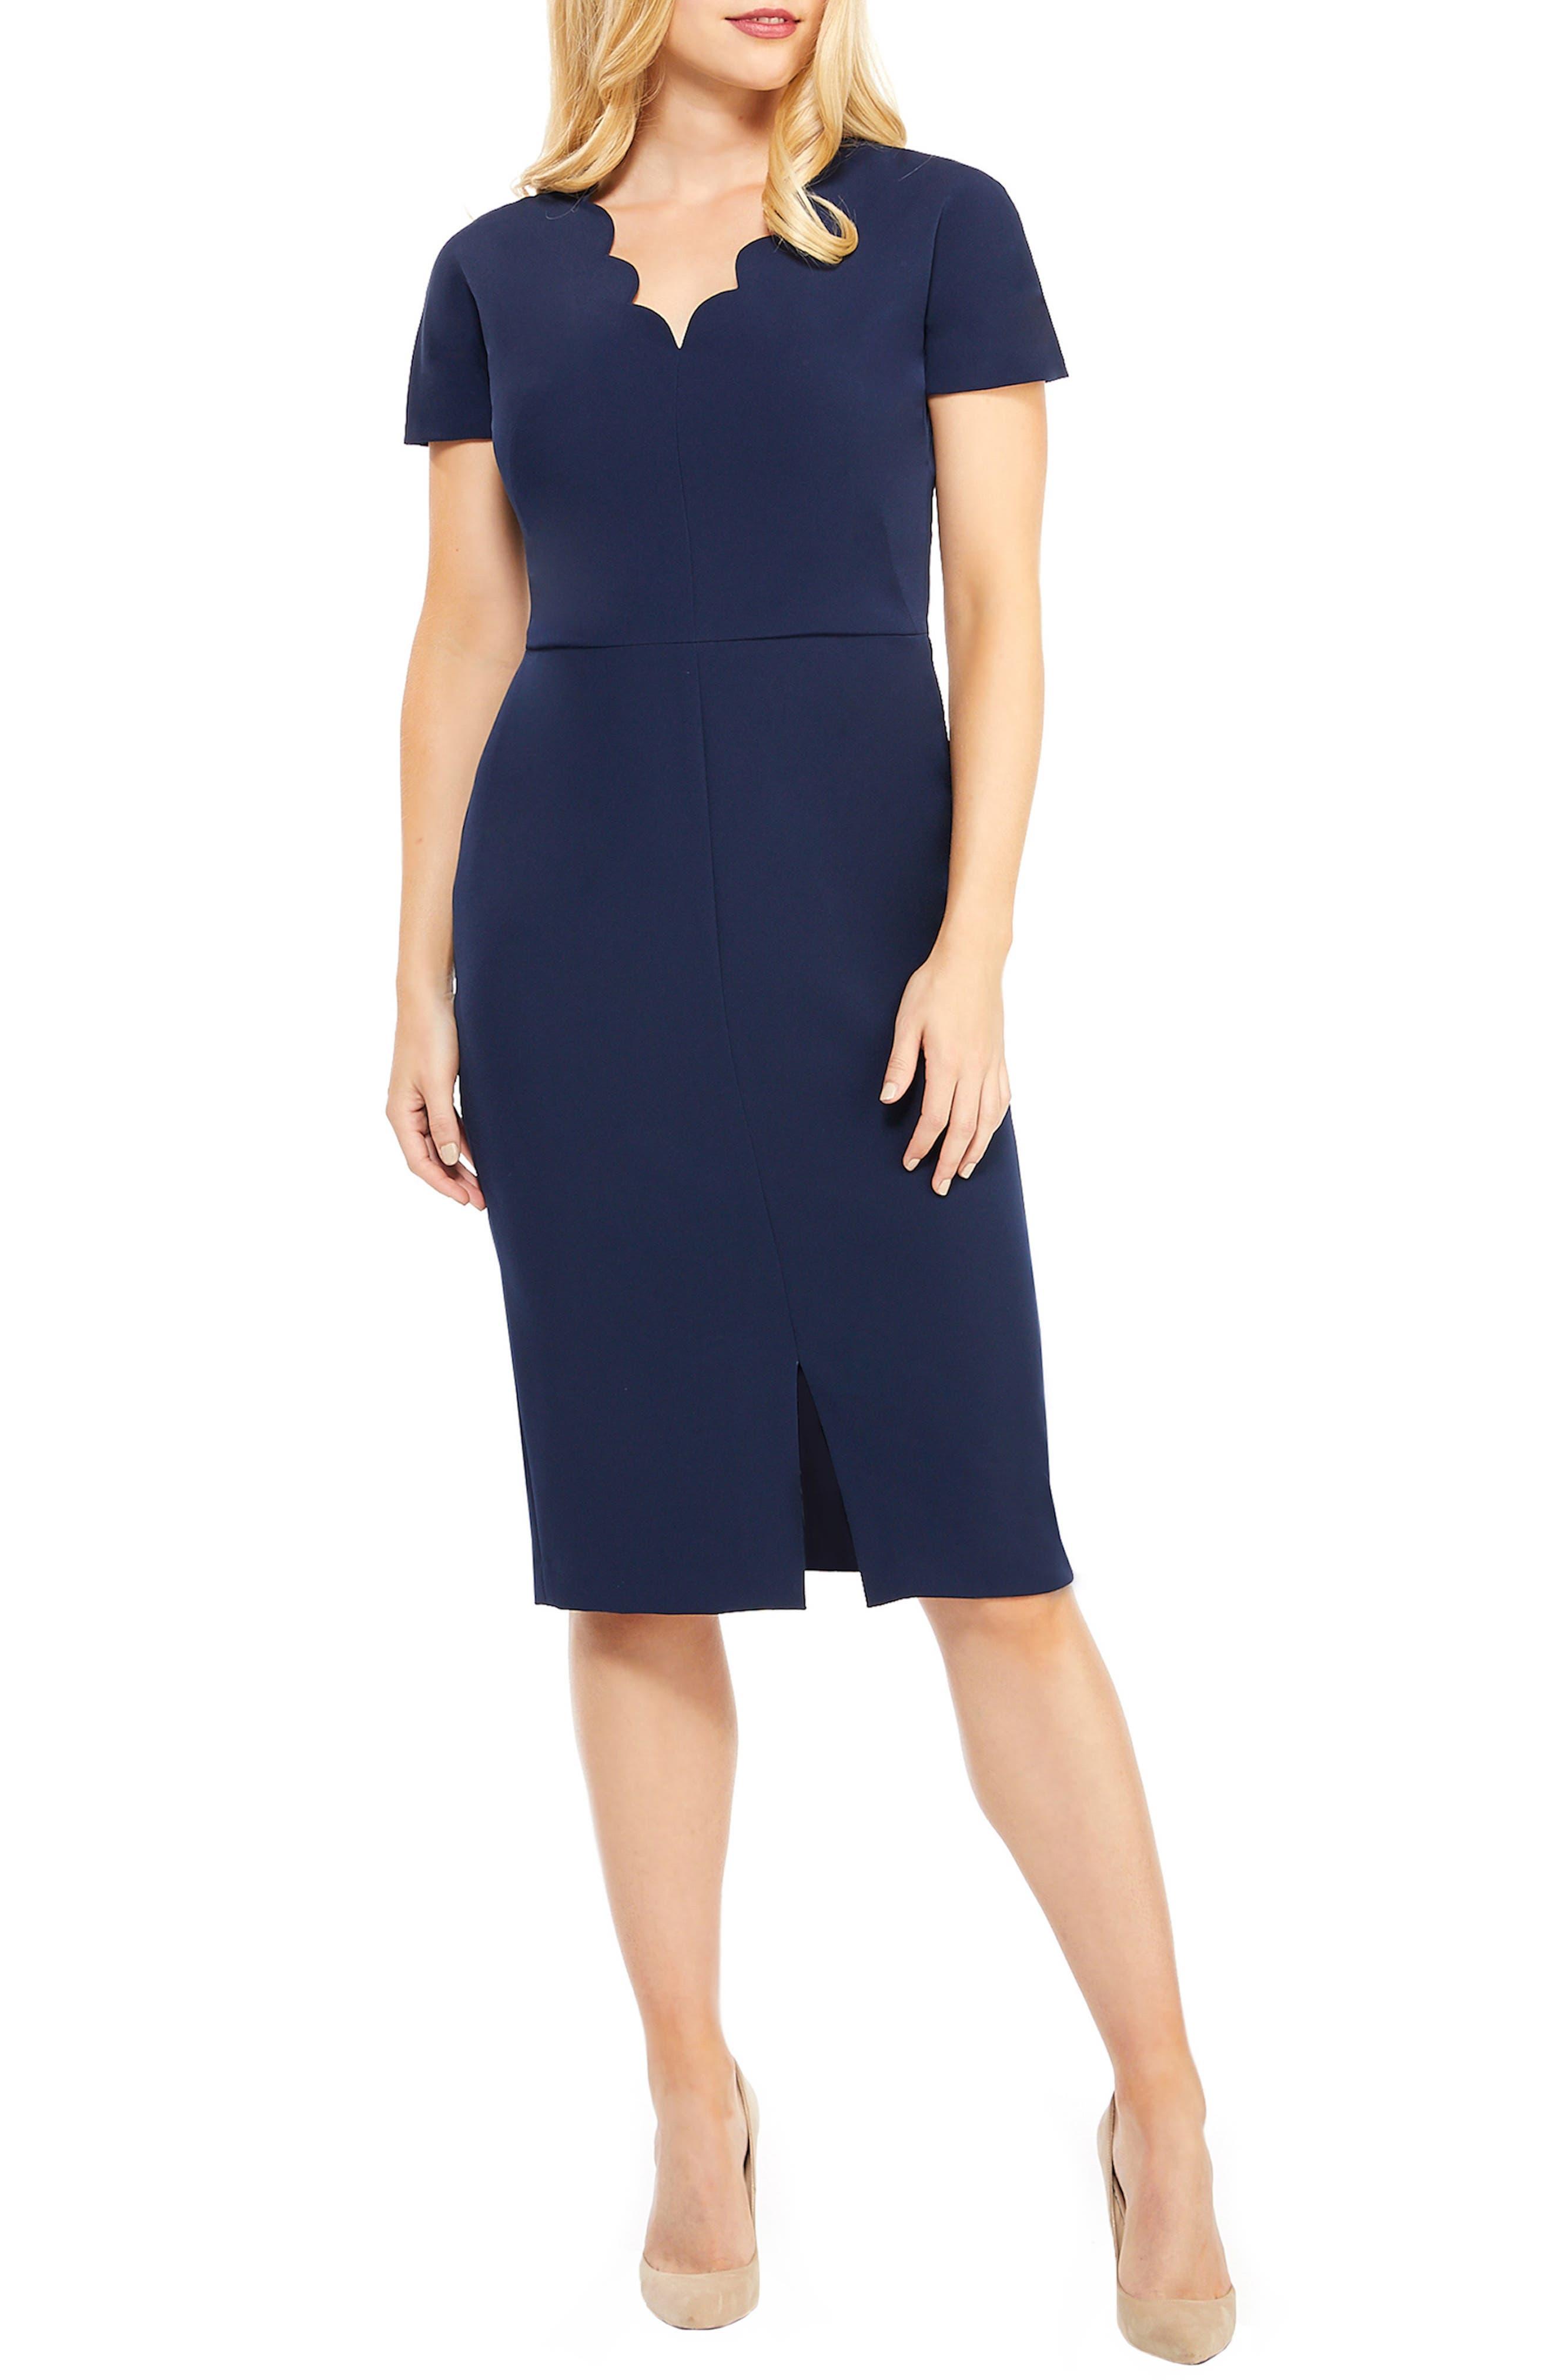 Scallop Sheath Dress,                             Main thumbnail 1, color,                             415